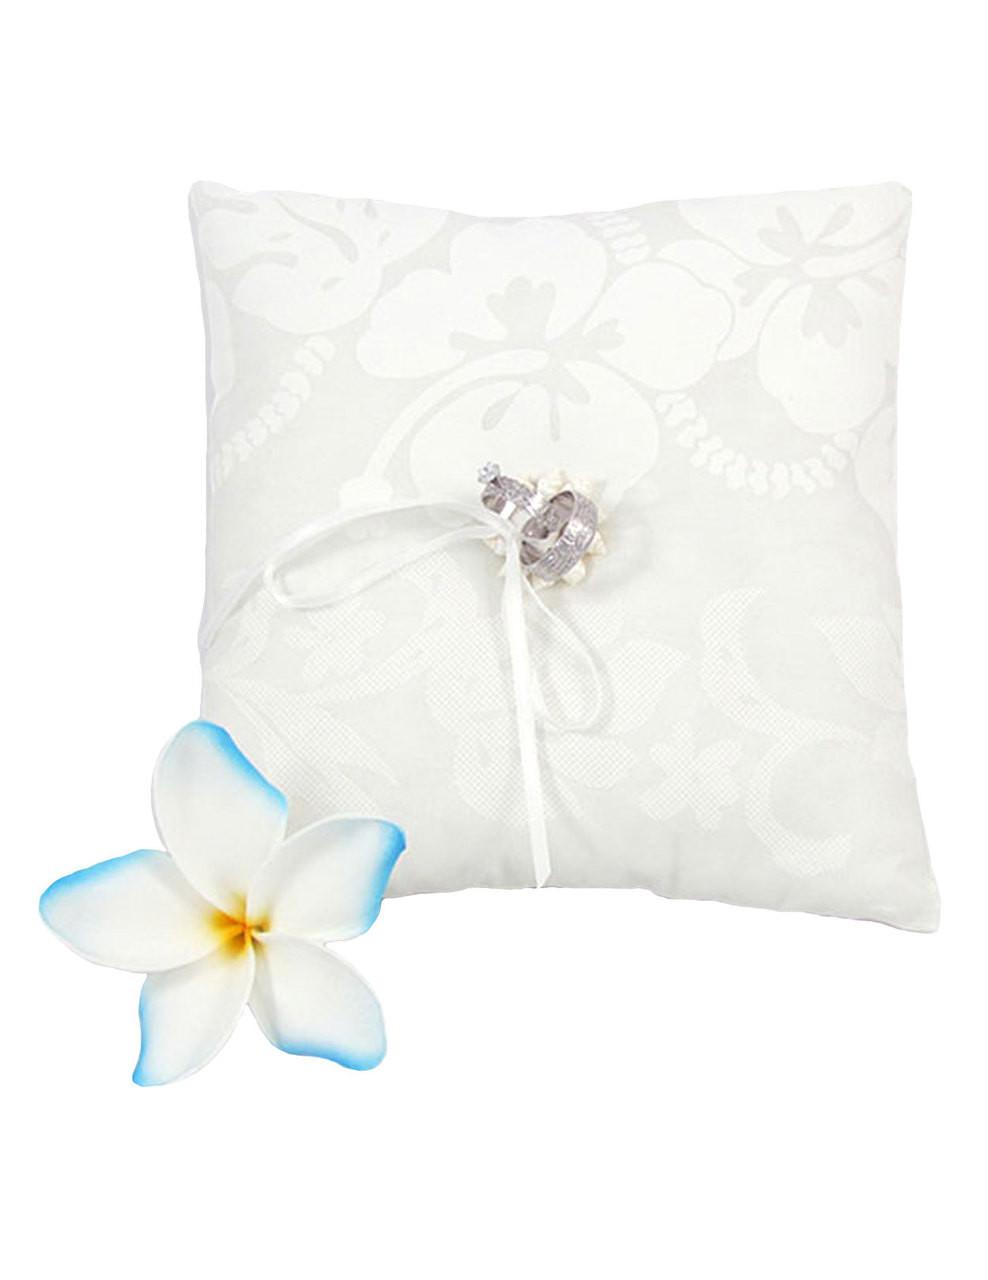 rings bearer pillow hawaiian hibiscus